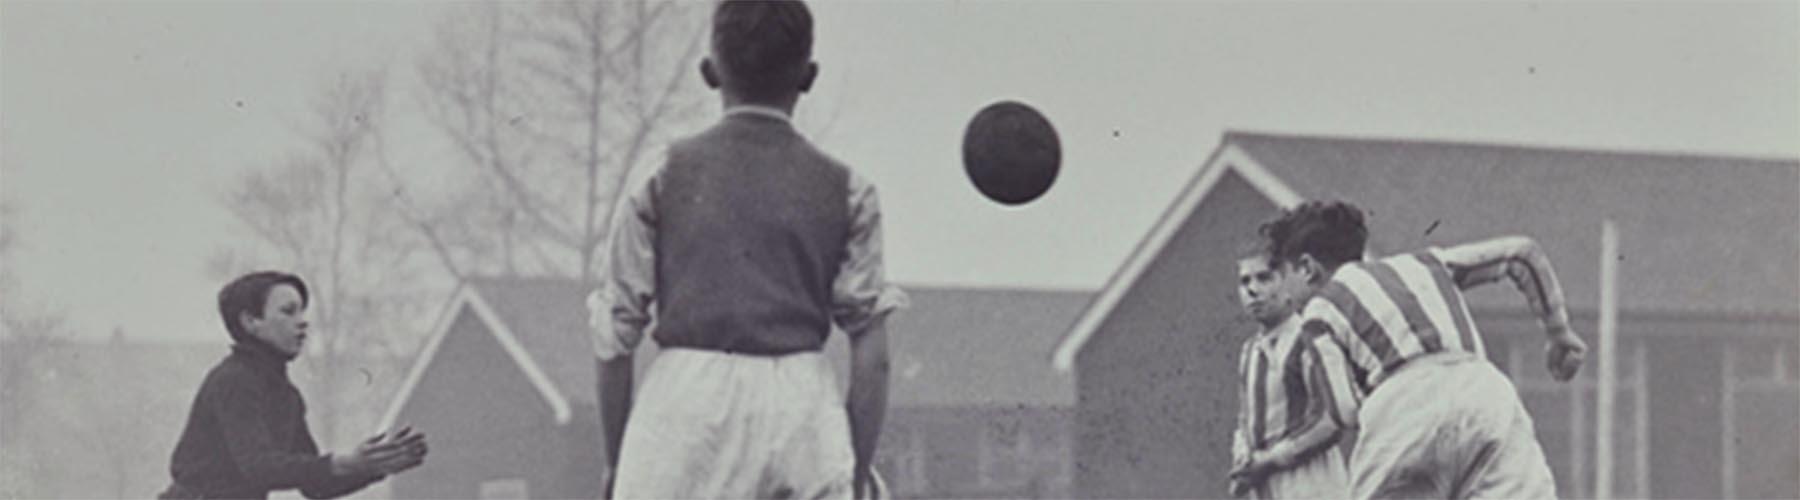 Historic photo of basketball